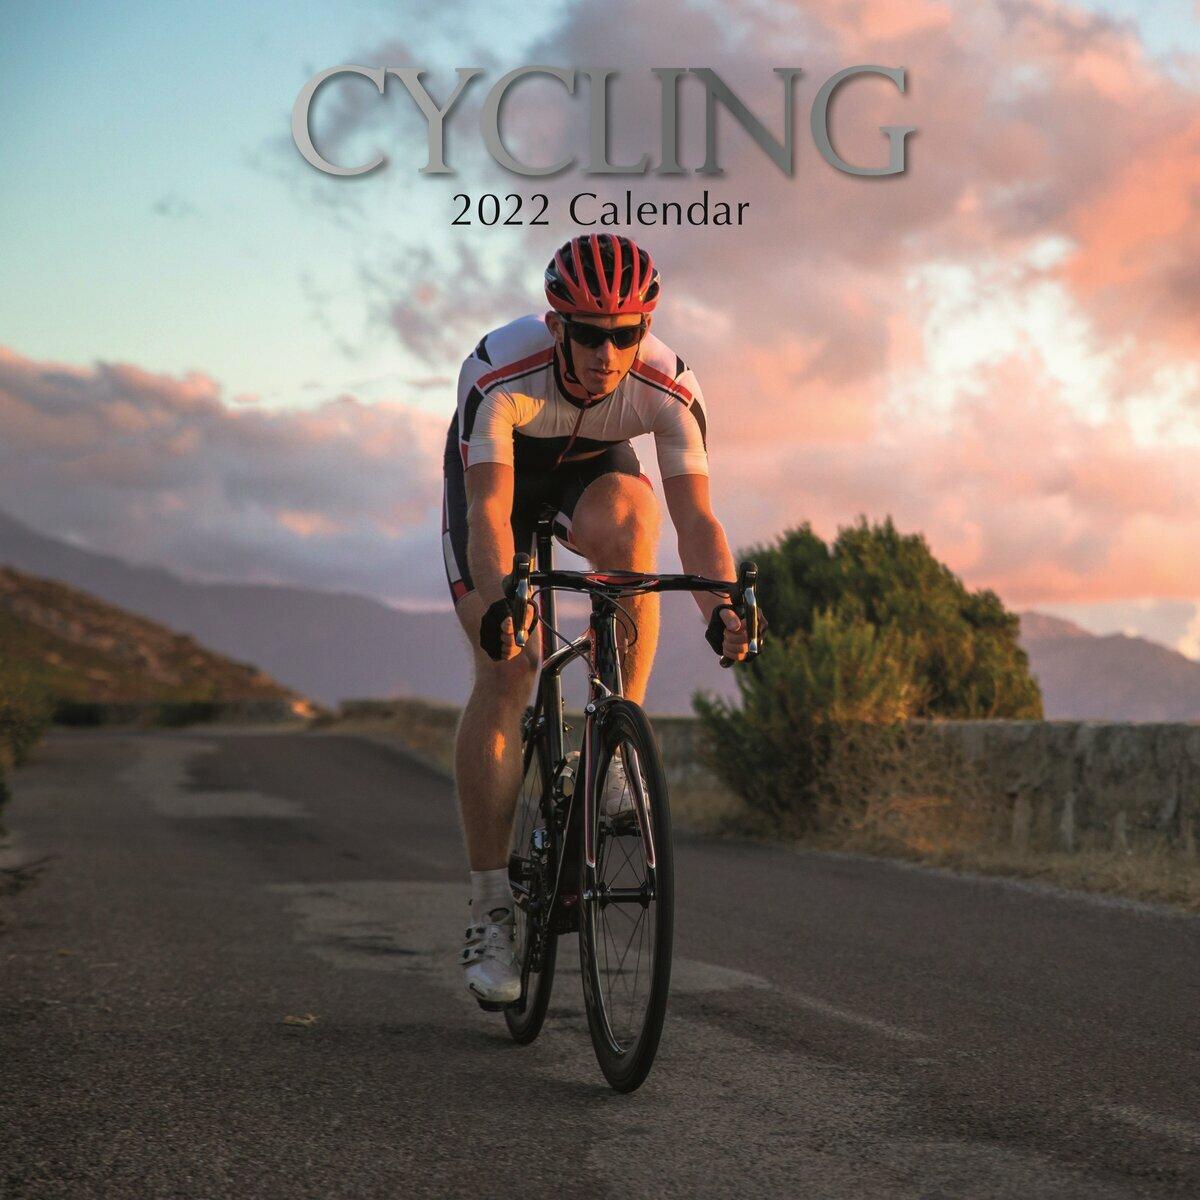 Calendrier Des Courses Cyclistes 2022 Calendrier 2022 Cyclisme